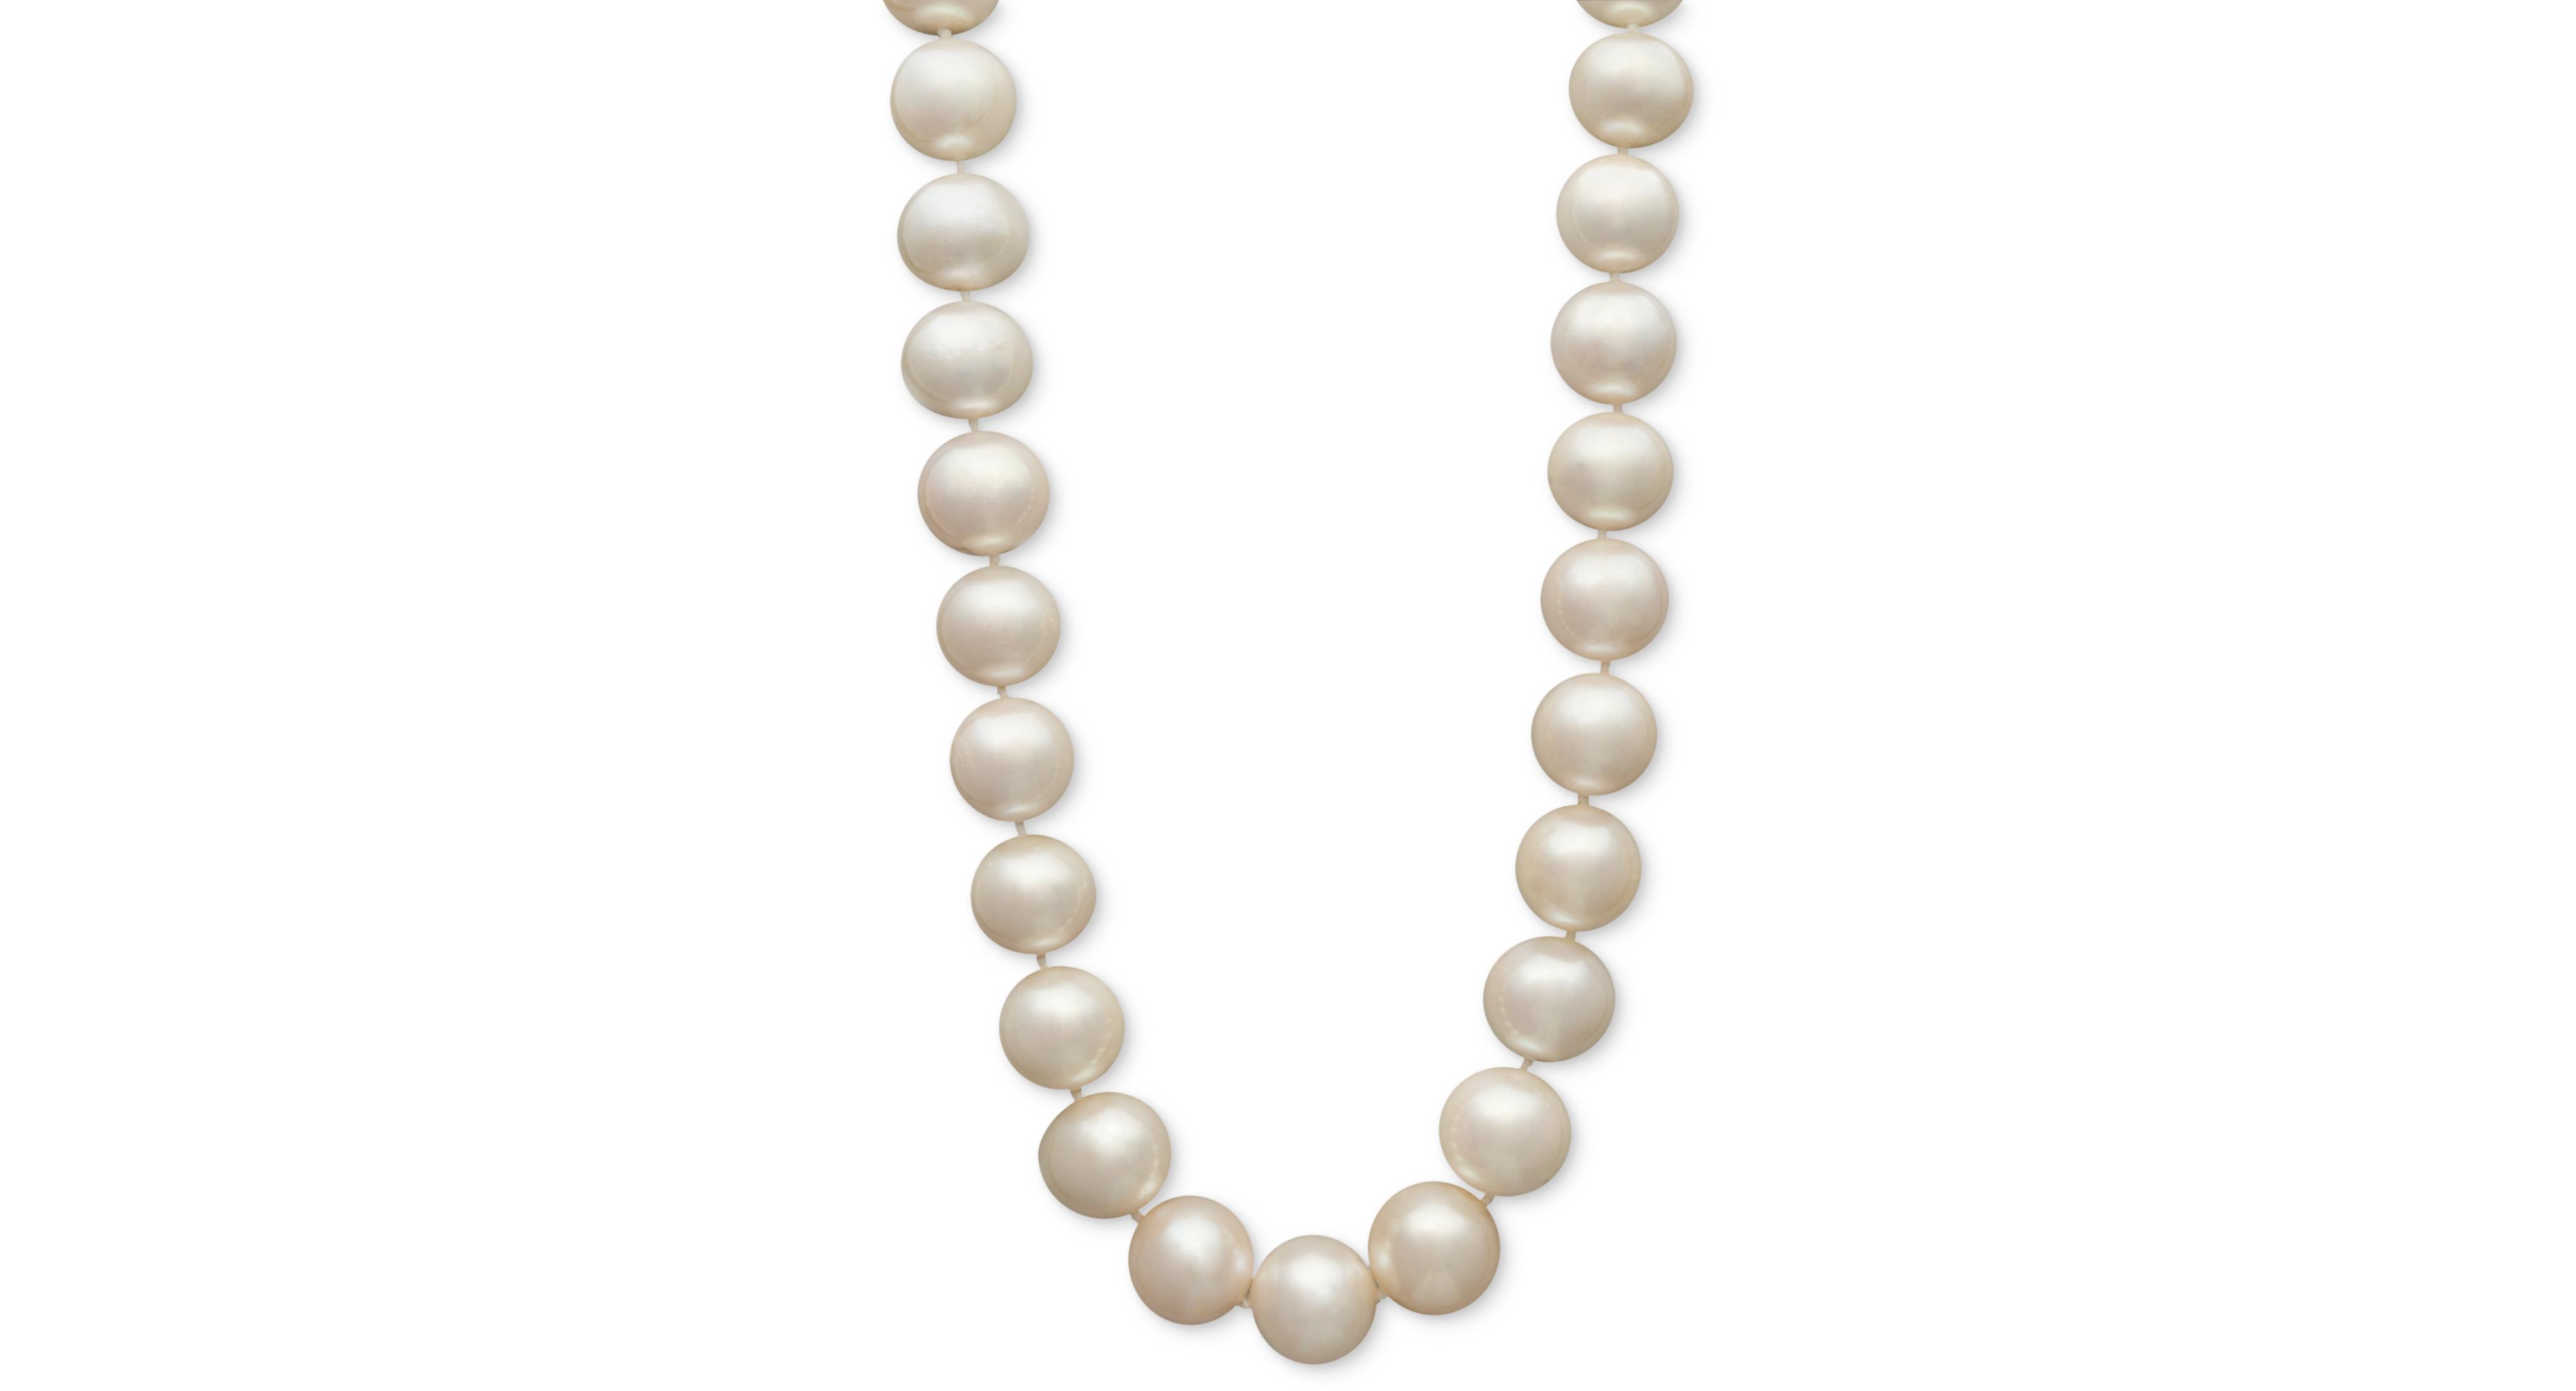 Belle de Mer Aa Cultured Freshwater Pearl Strand in 14k Gold (11-1/2 - 12-1/2mm)